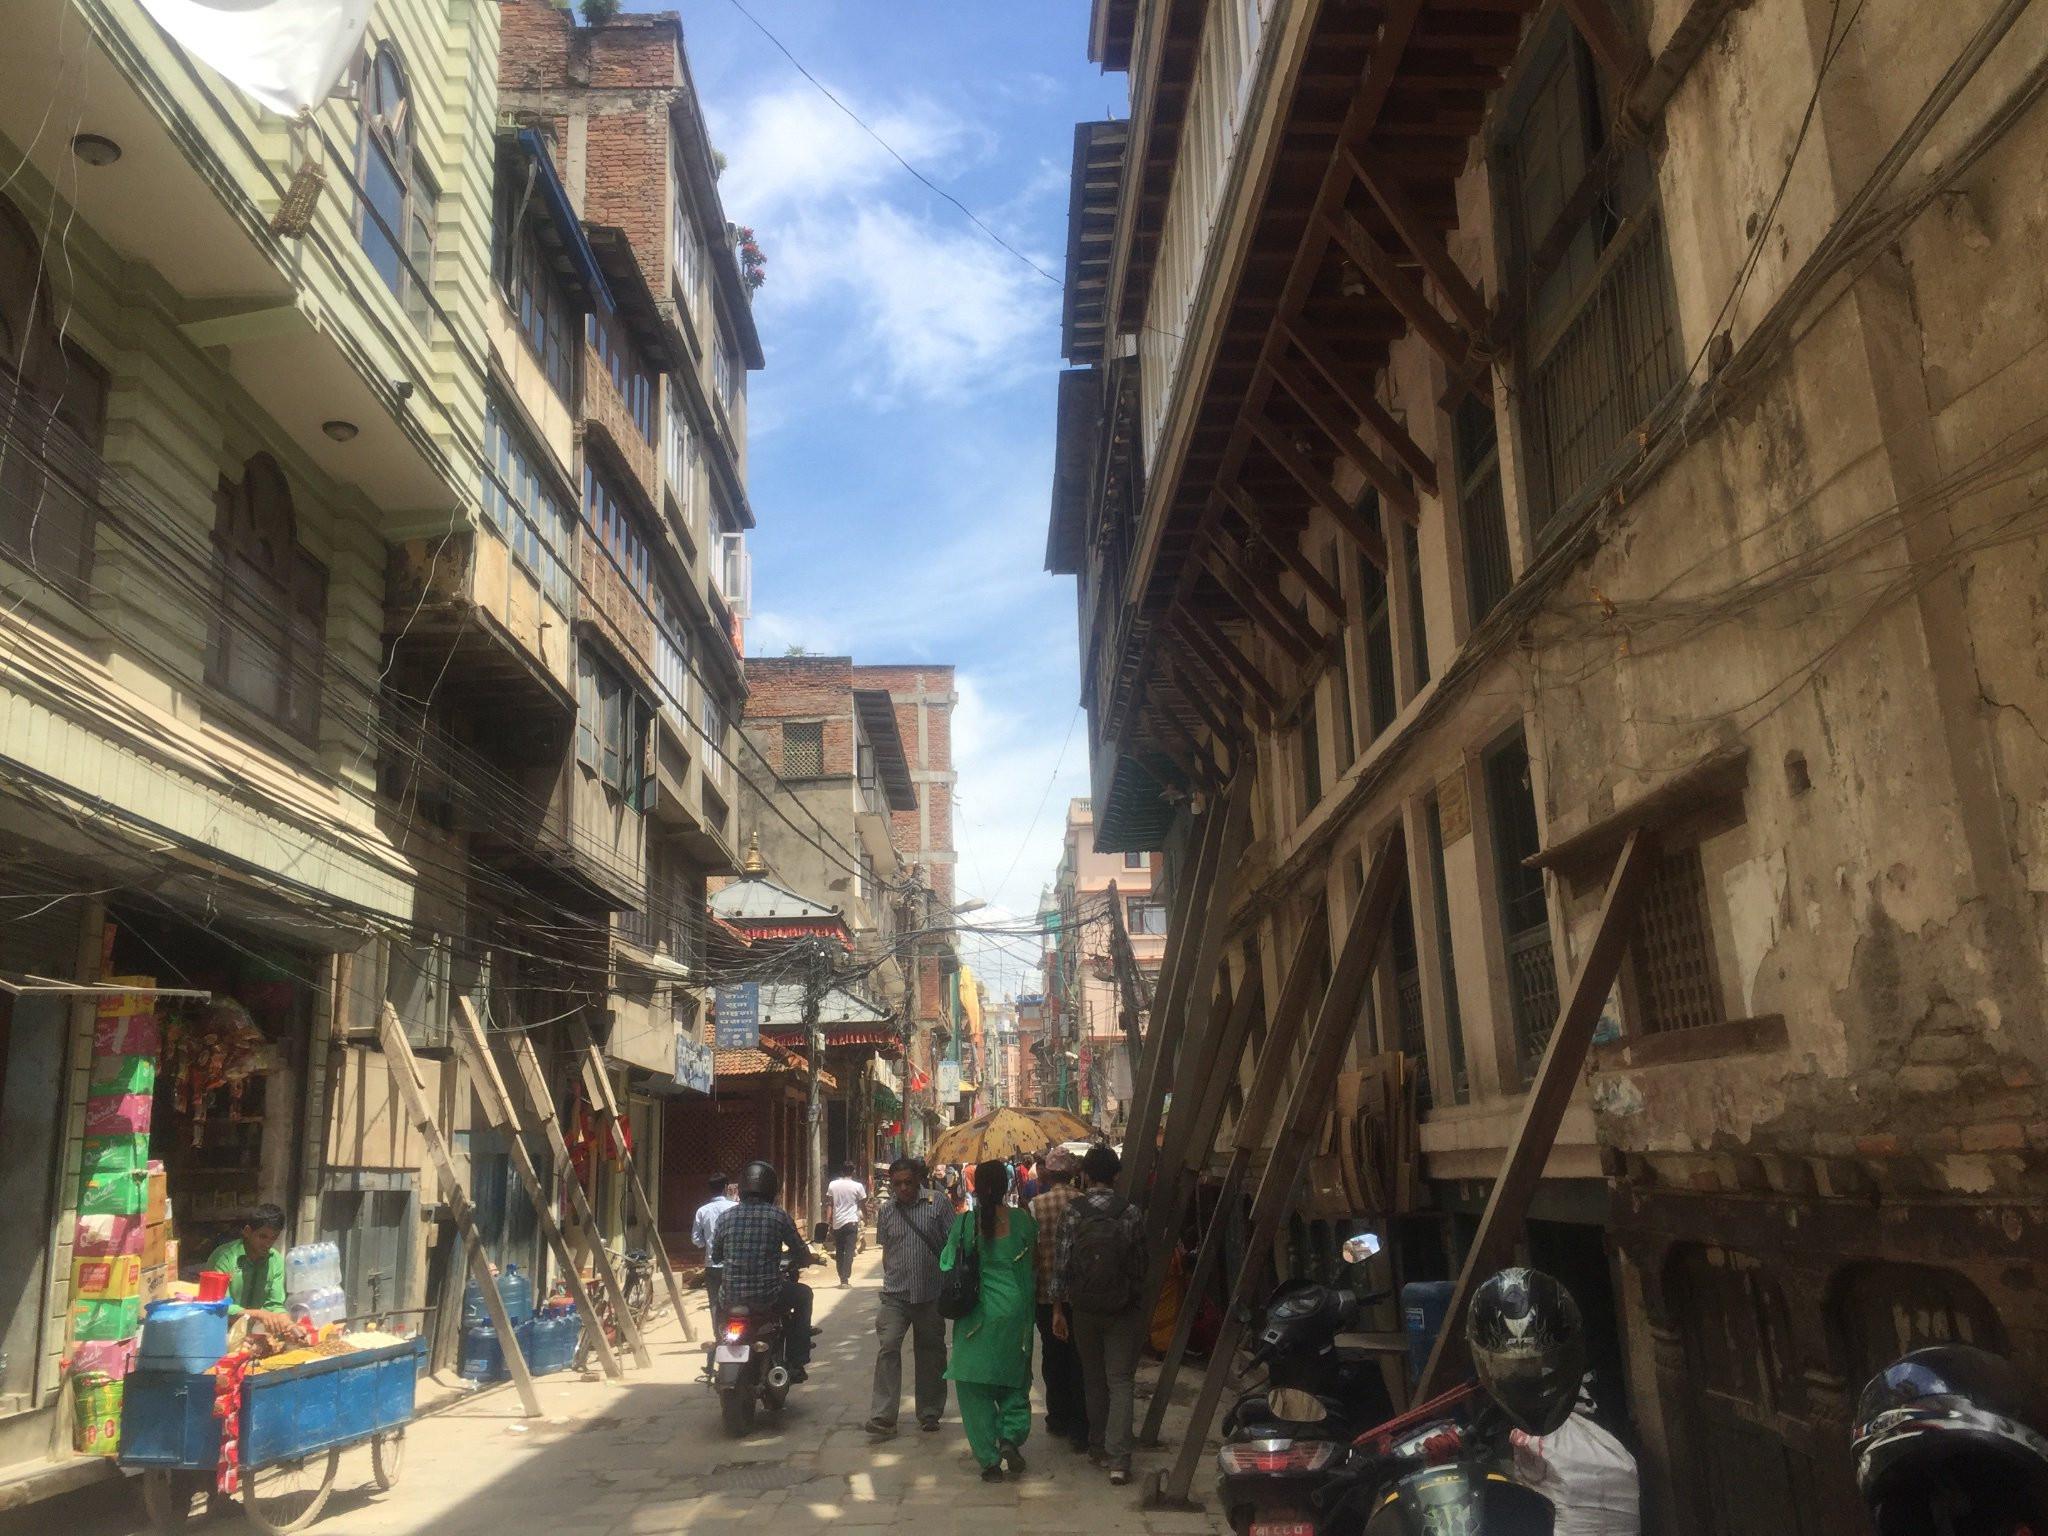 'हाउस पुलिङ' ले काठमाडौं संस्कृति जोगिएला?